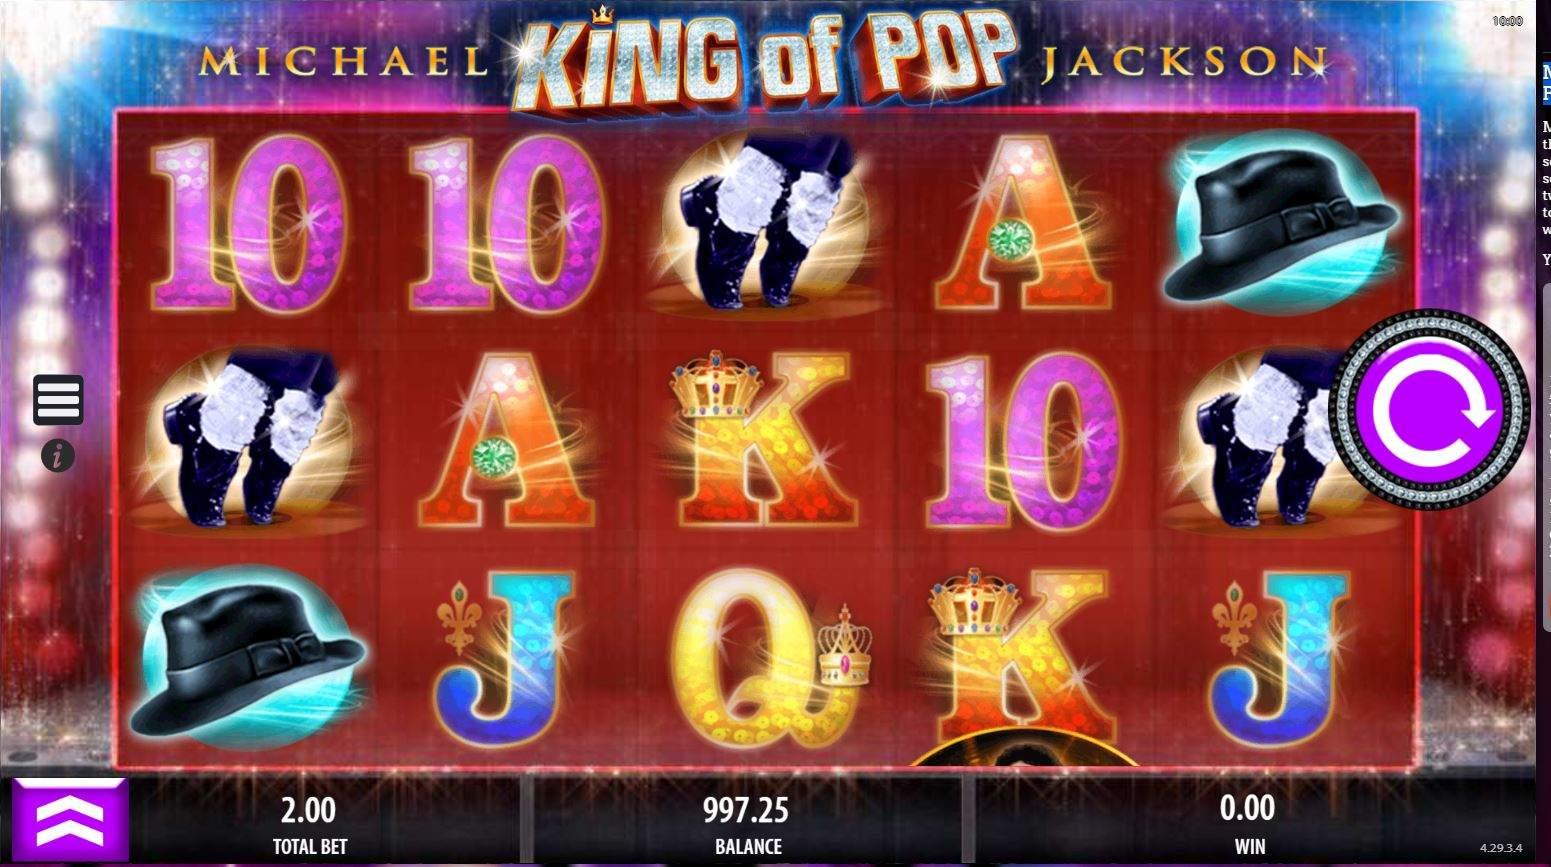 Michael Jackson Slot Machine - The King of Pop Online Slot Review